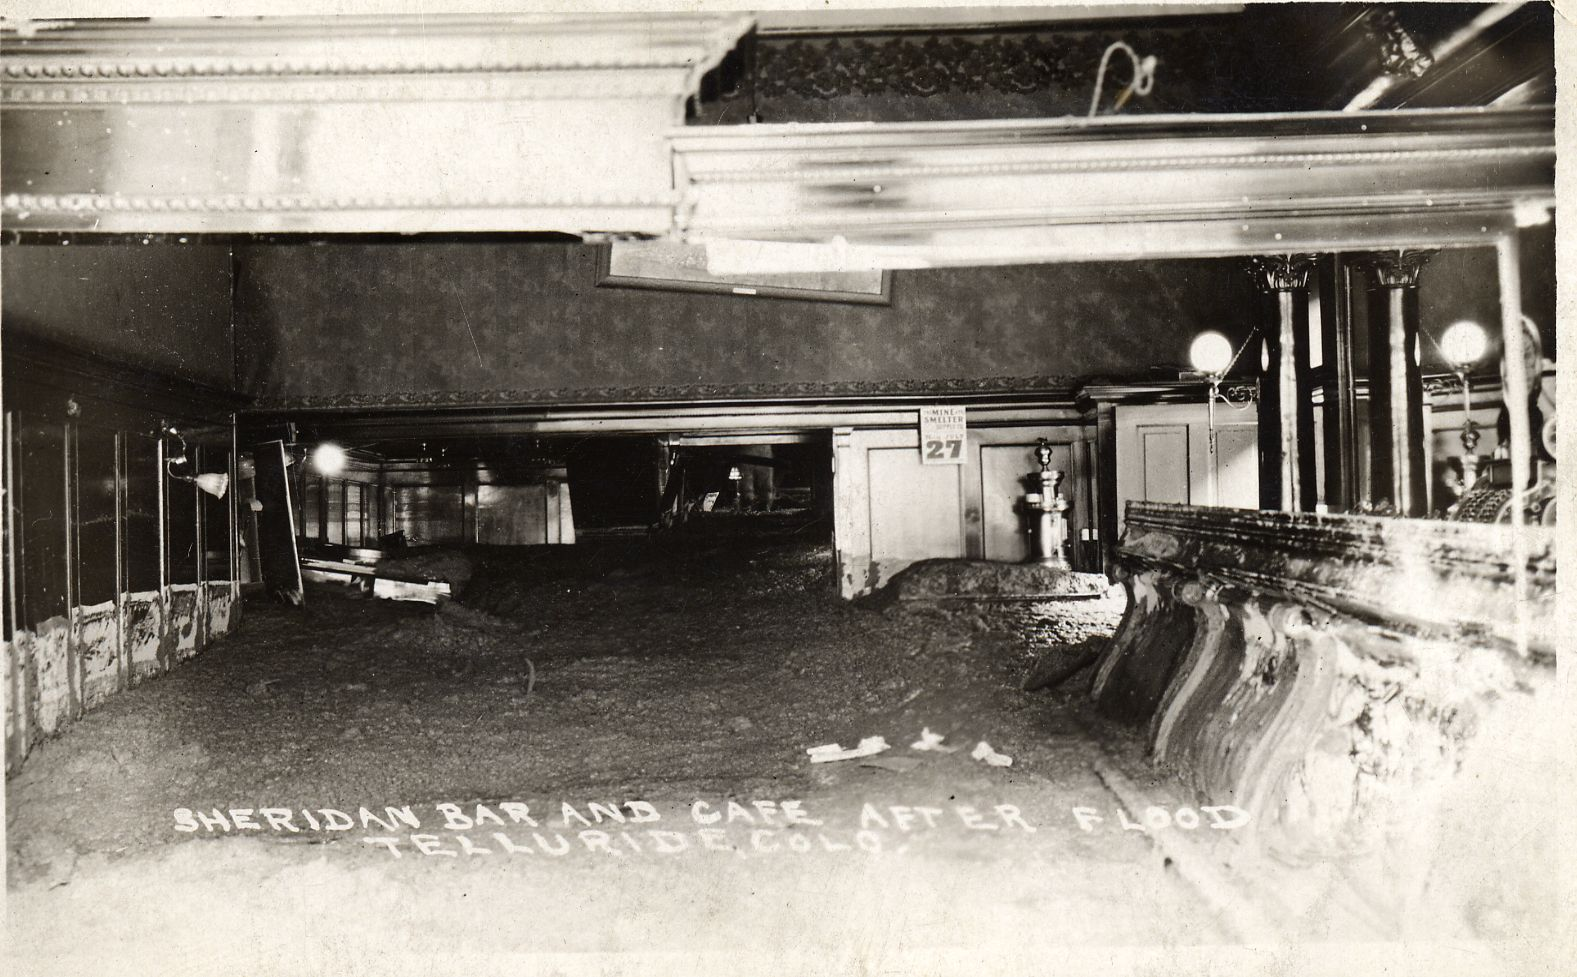 Photo: 1914 Sheridan Bar and Grill, Telluride